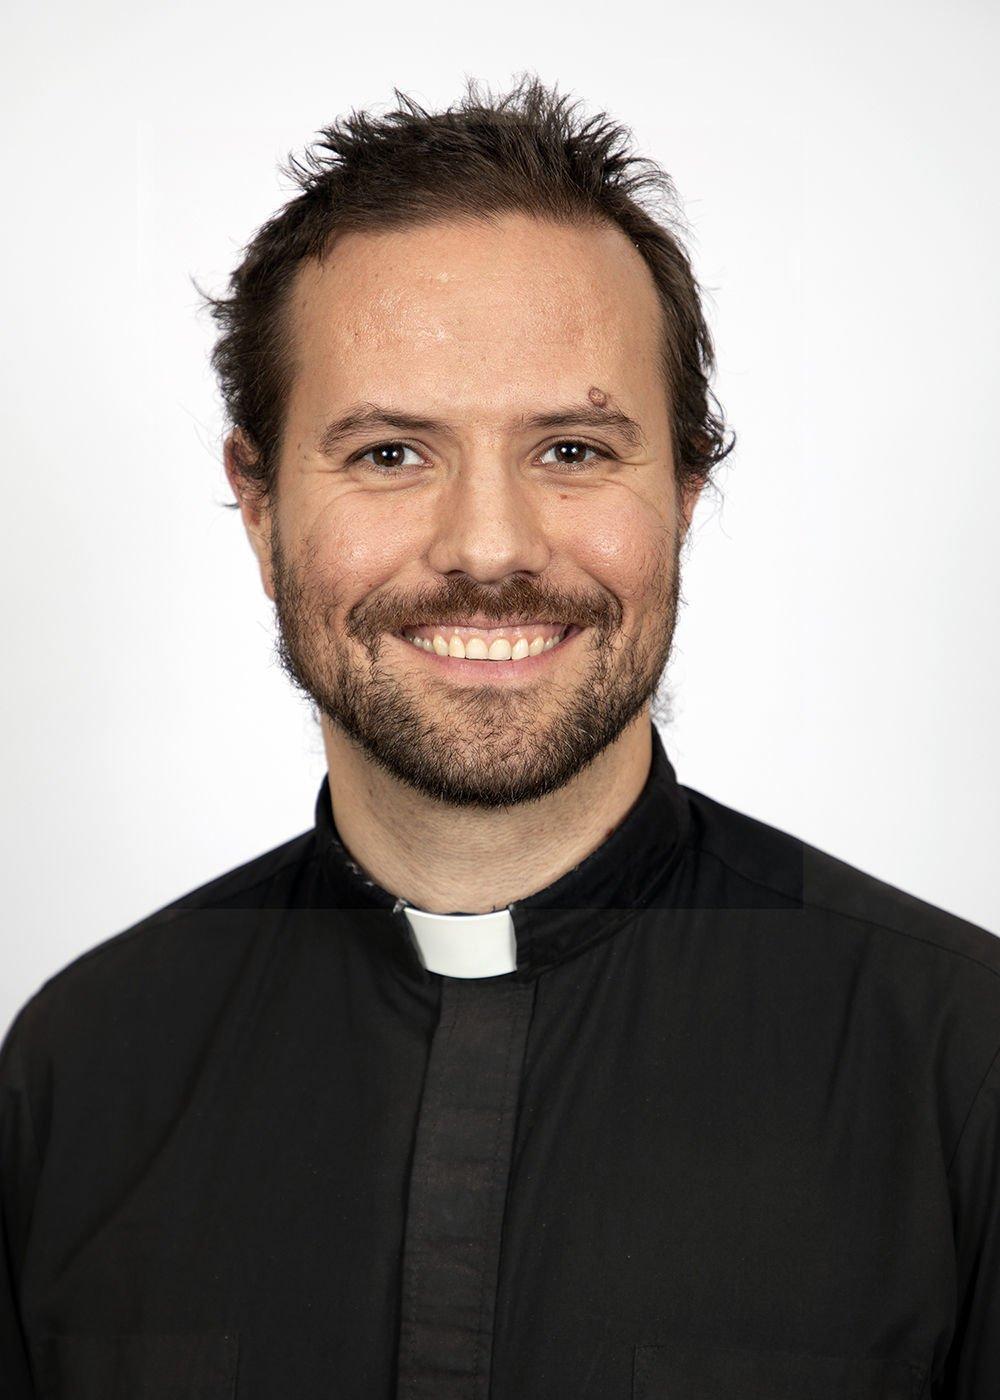 Rev Jonathan W. Barker MLK Humanitarian Award Recipient